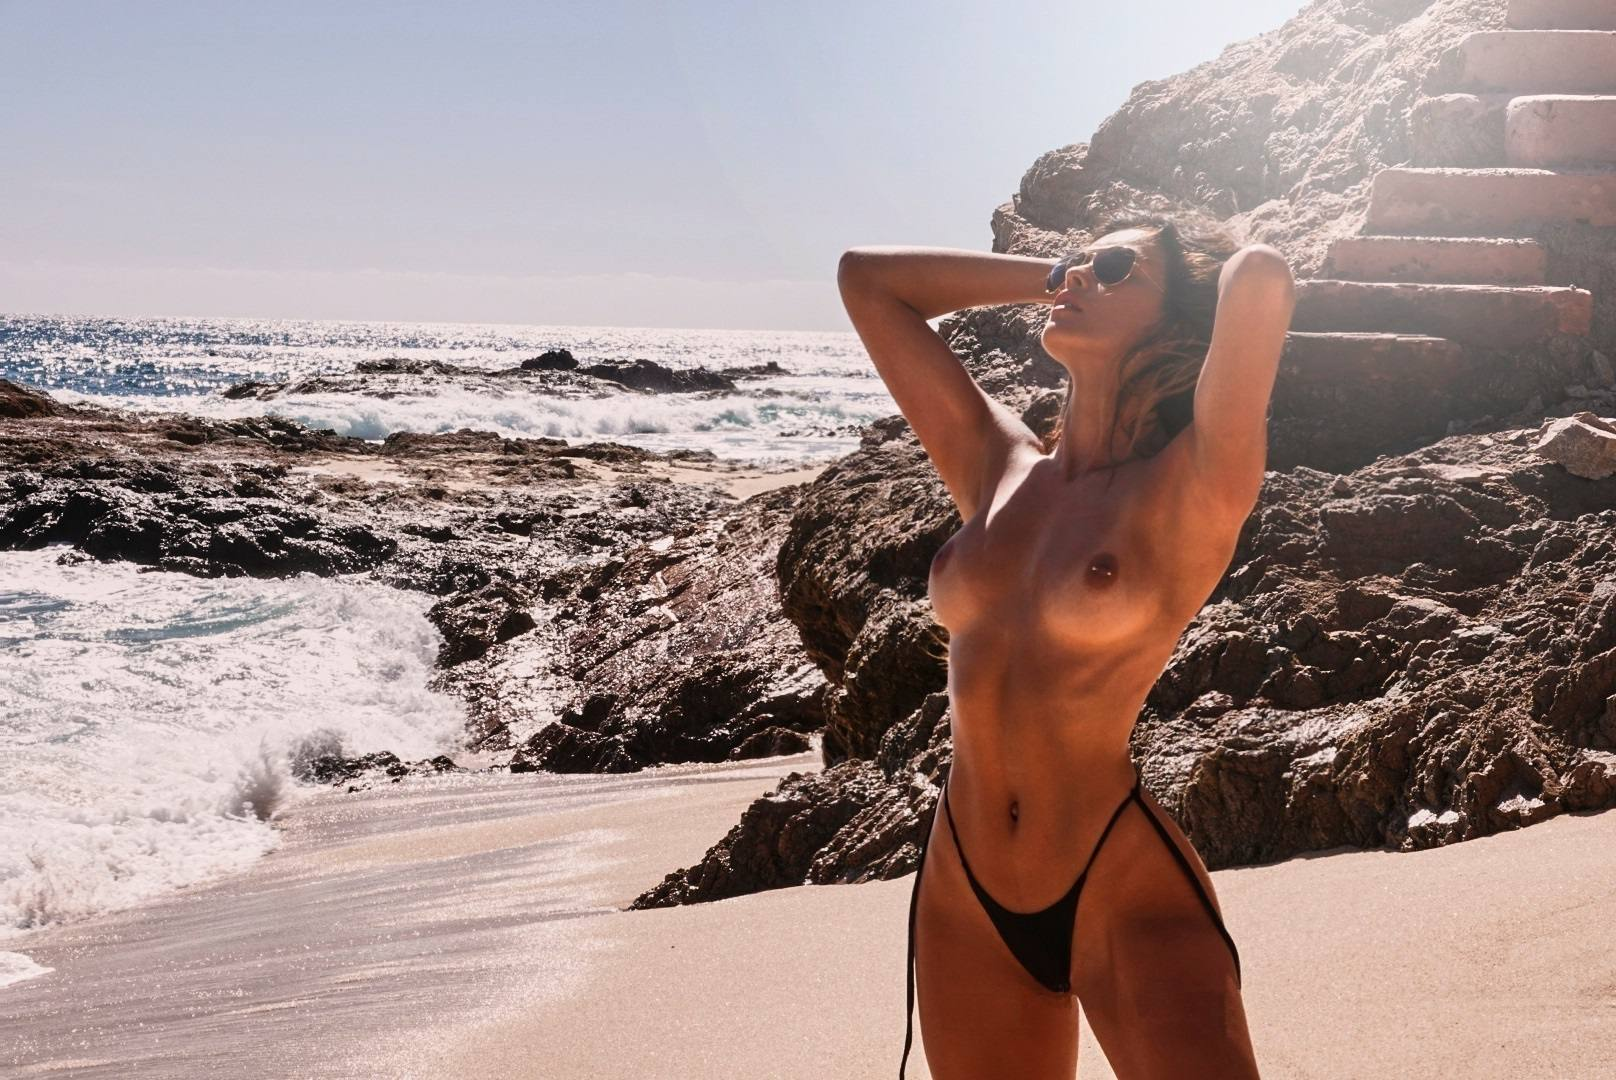 Cherokee Luker – Sexy Boobs In Beautiful Topless Photoshoot By Josh Ryan (nsfw) 0004